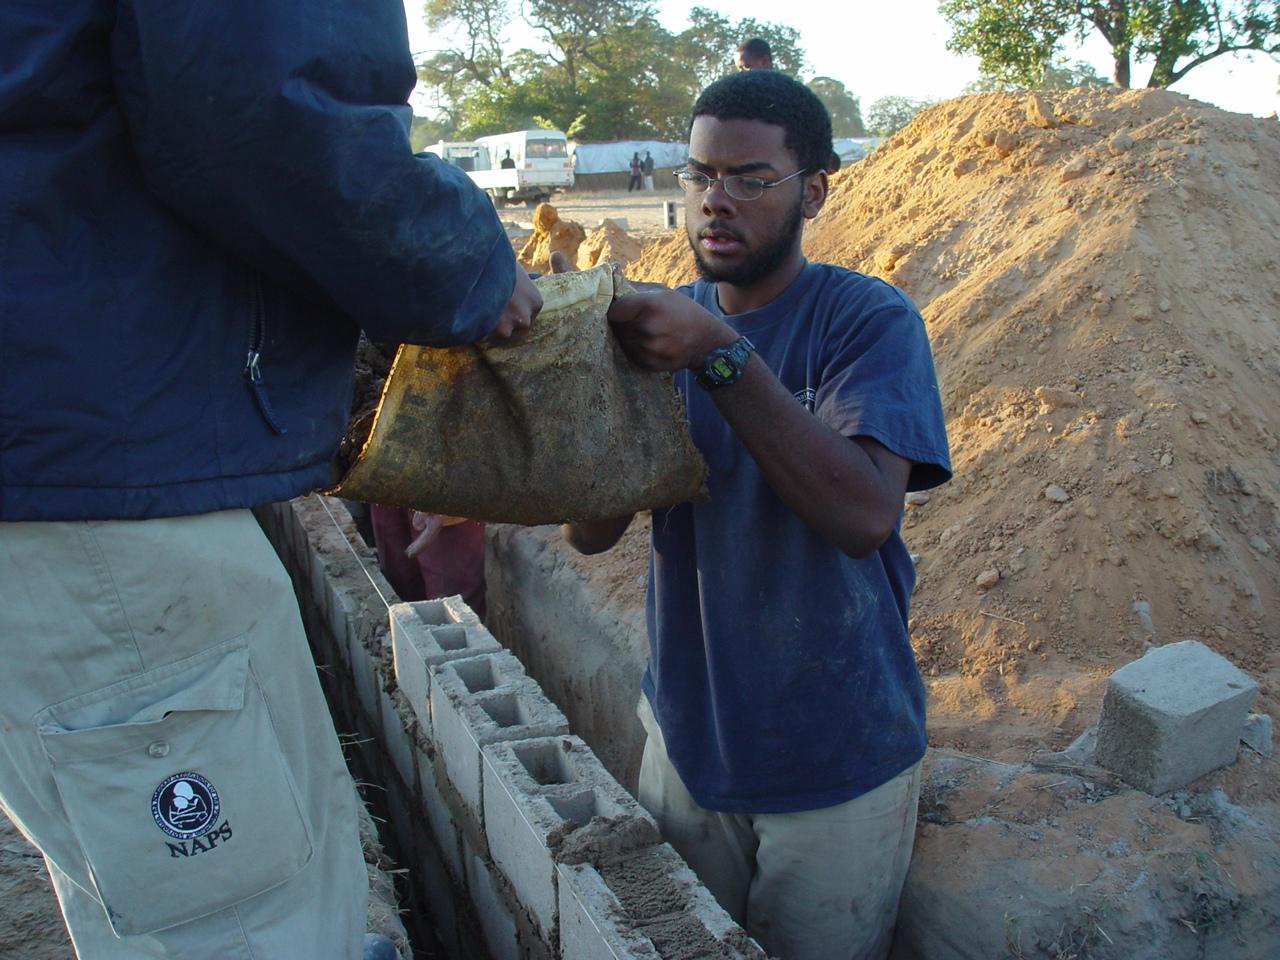 Picture zambia2 066.jpg